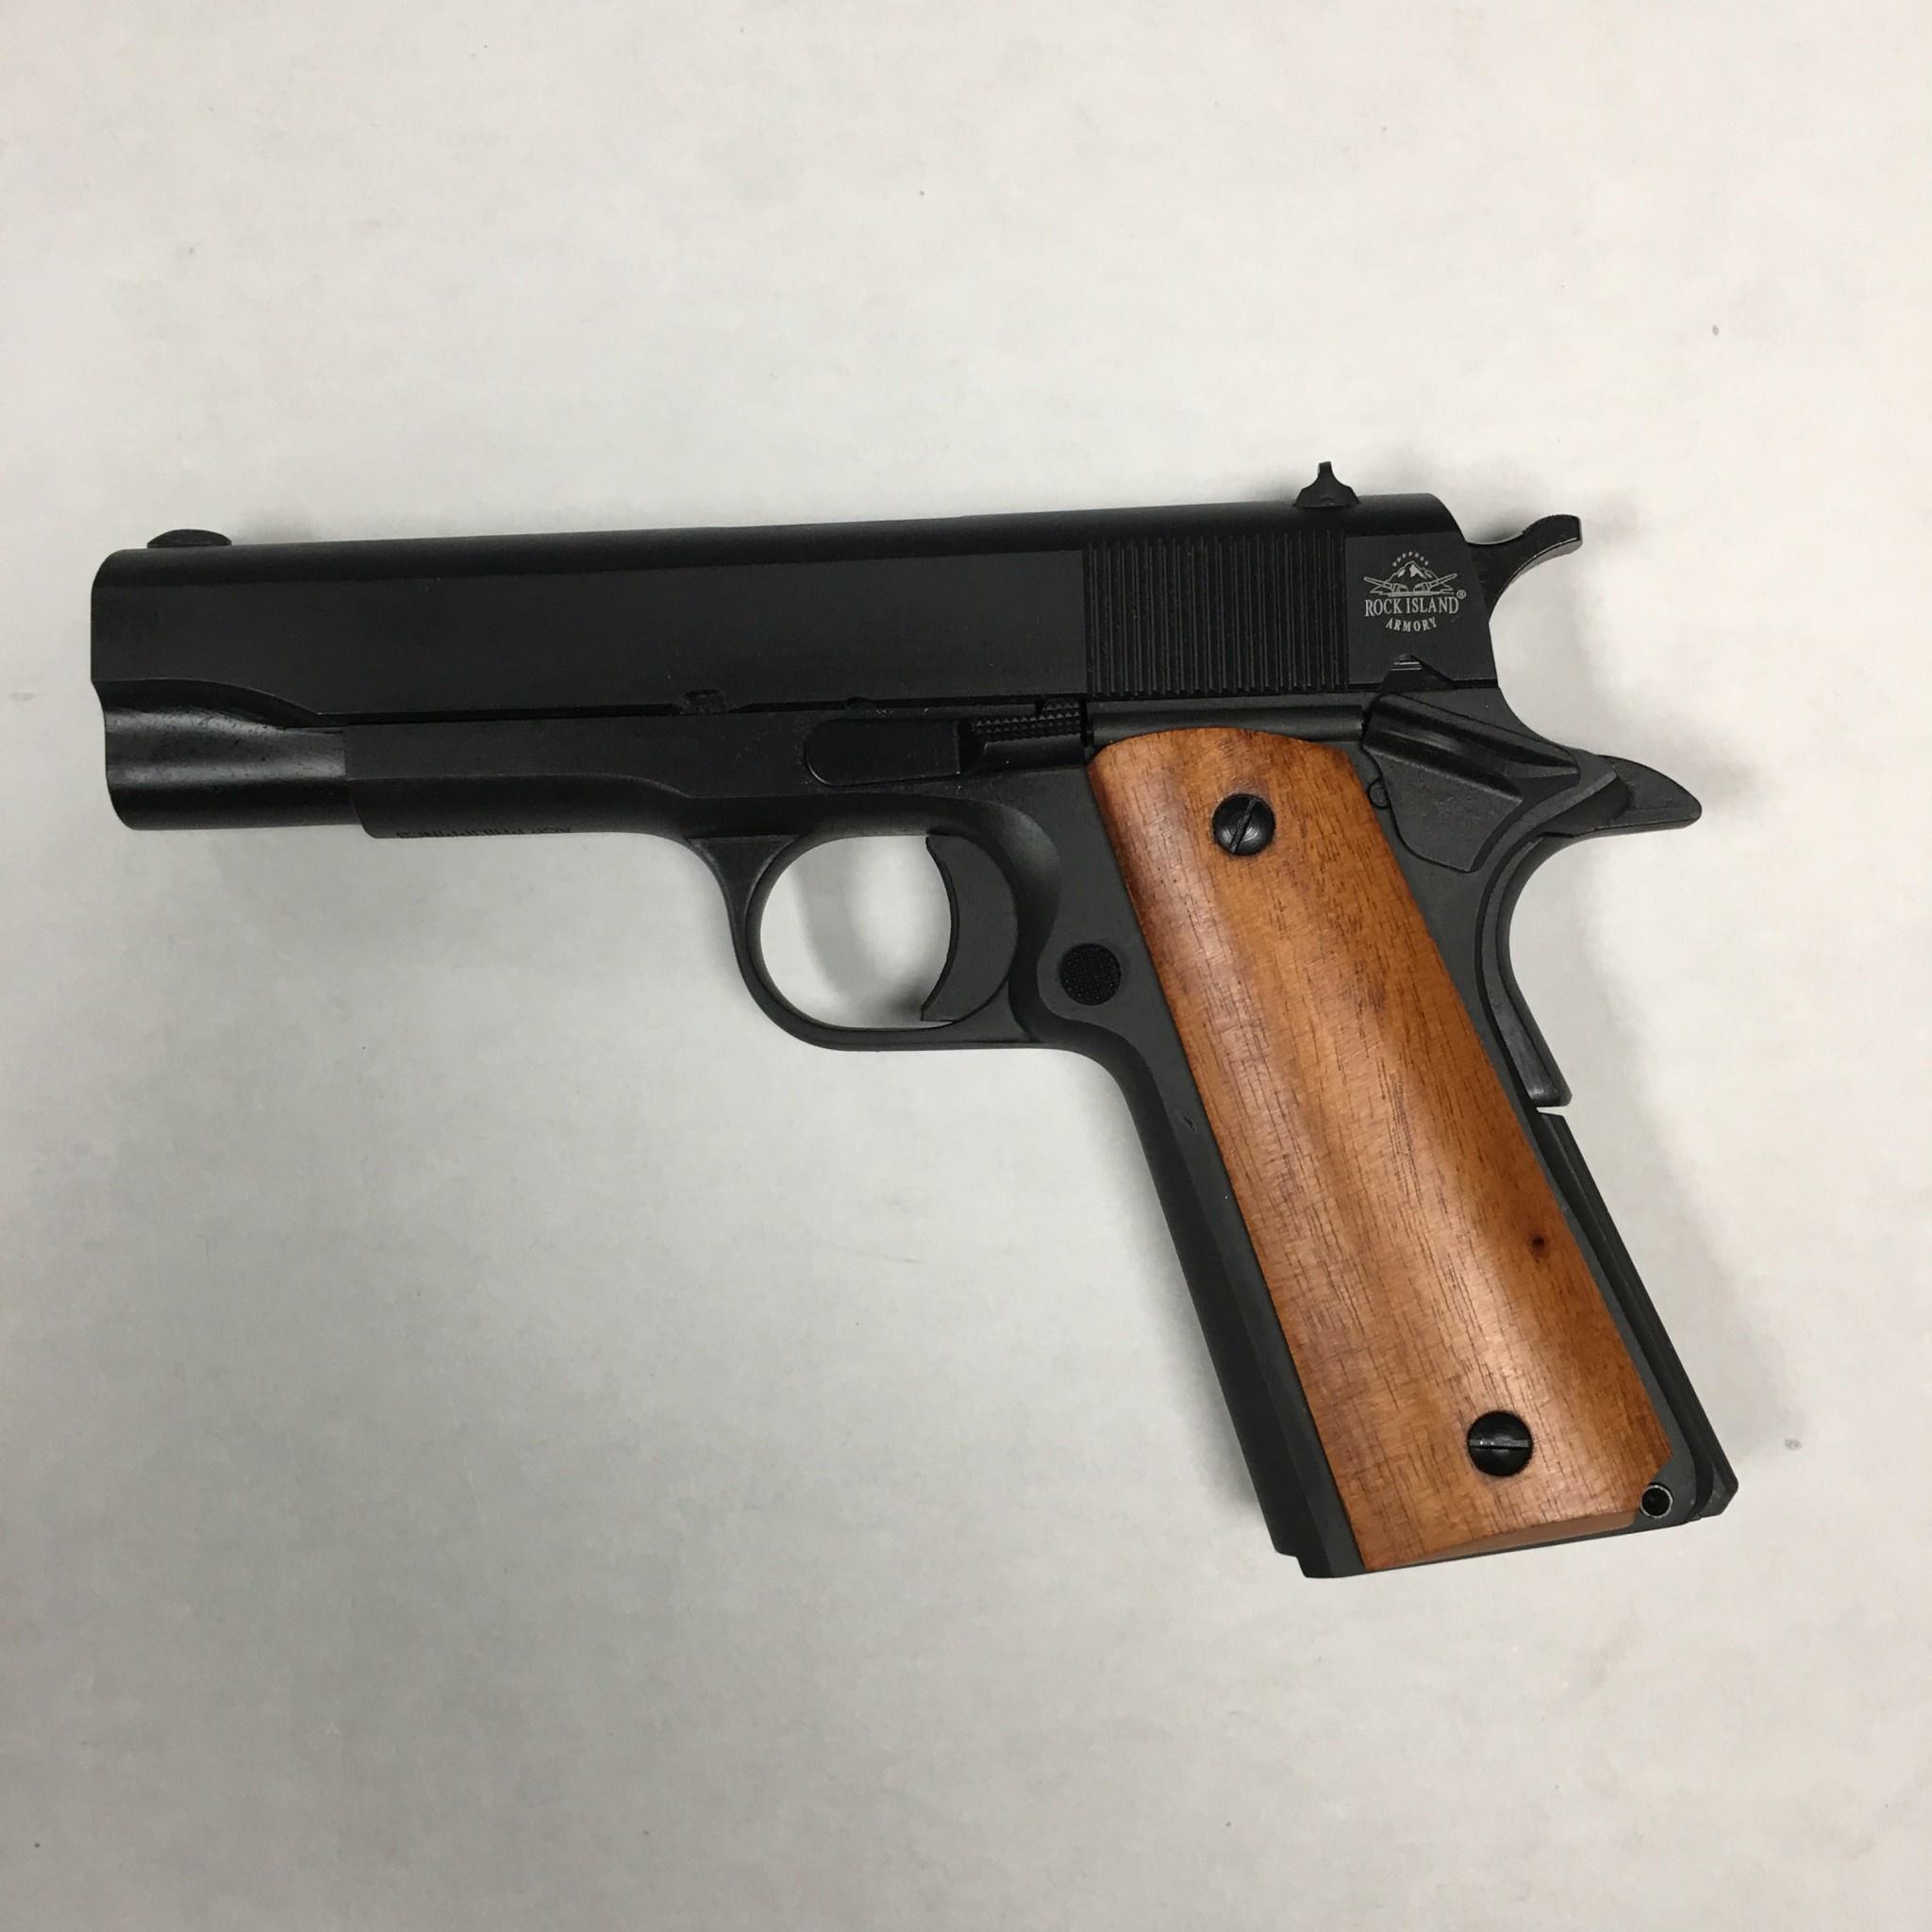 Rock Island M1911 A1-MS Pistol 45ACP